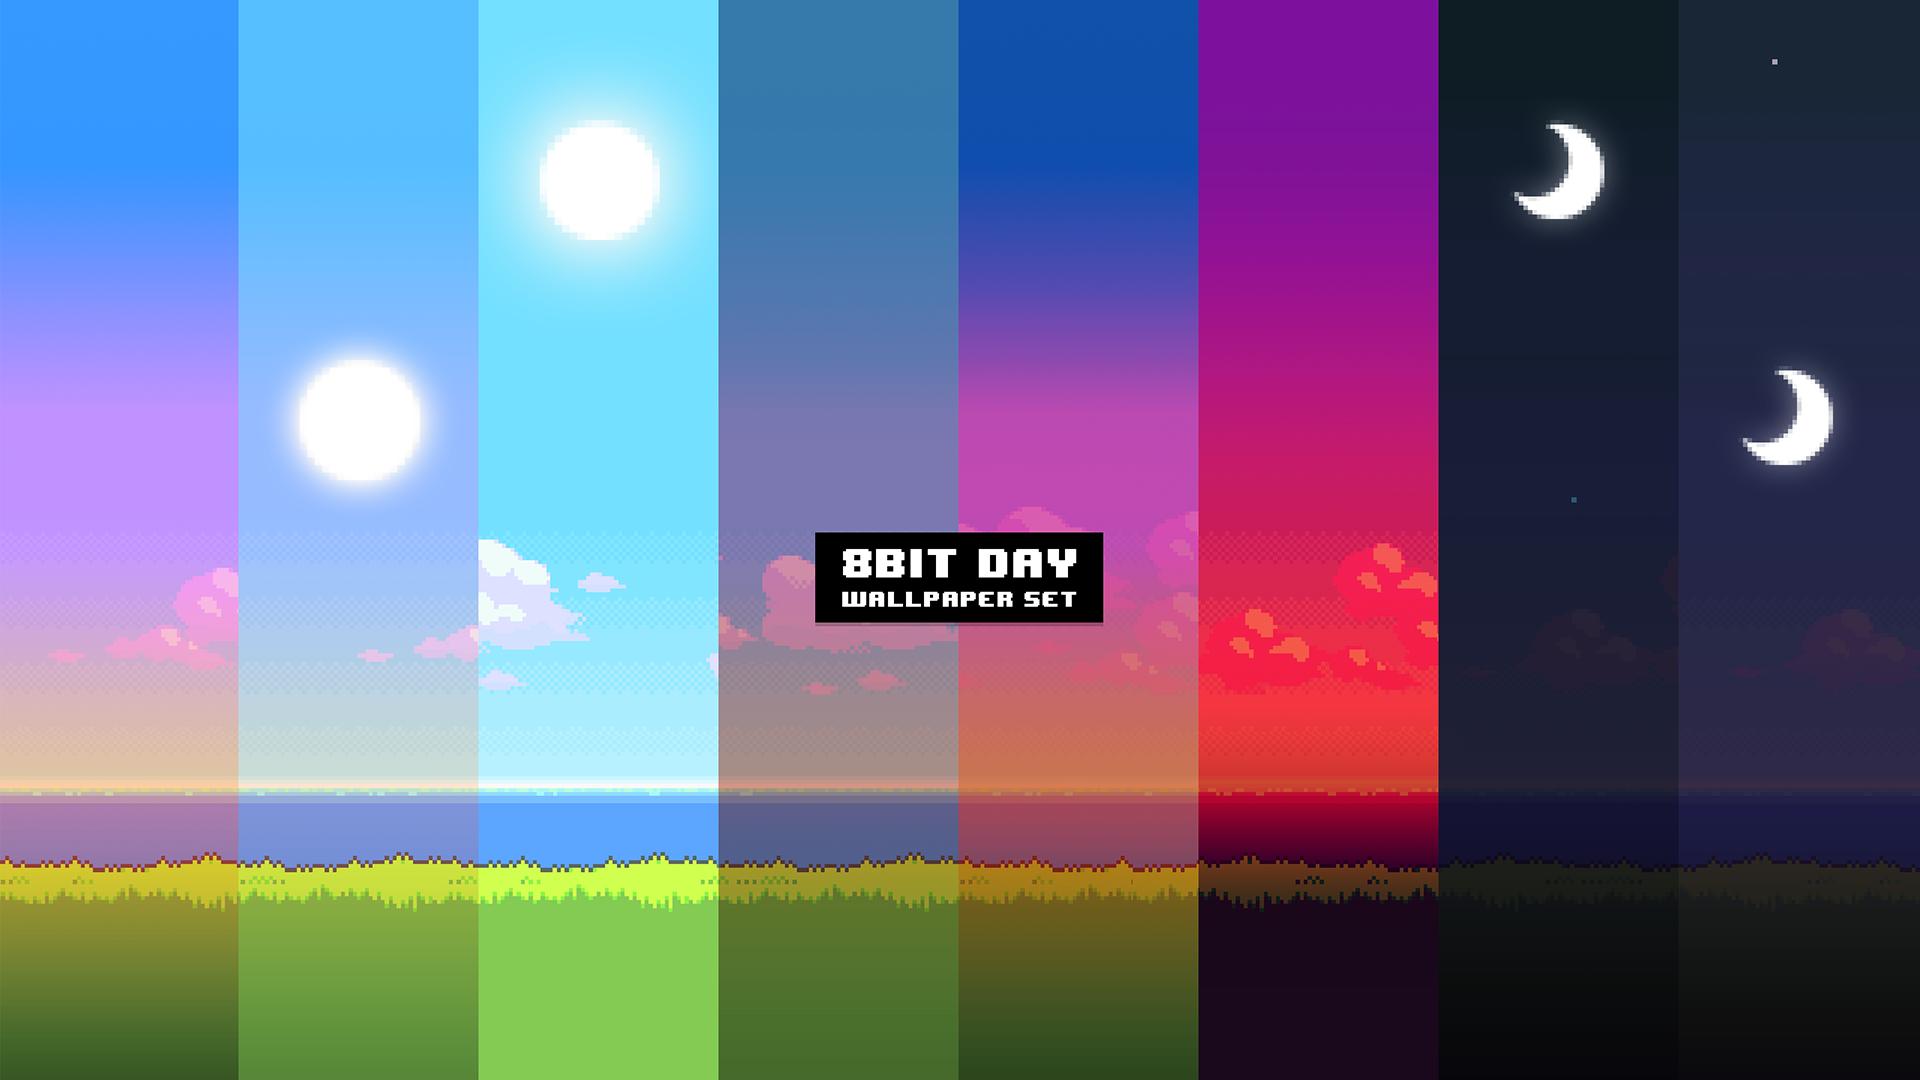 8Bit Day - Wallpaper